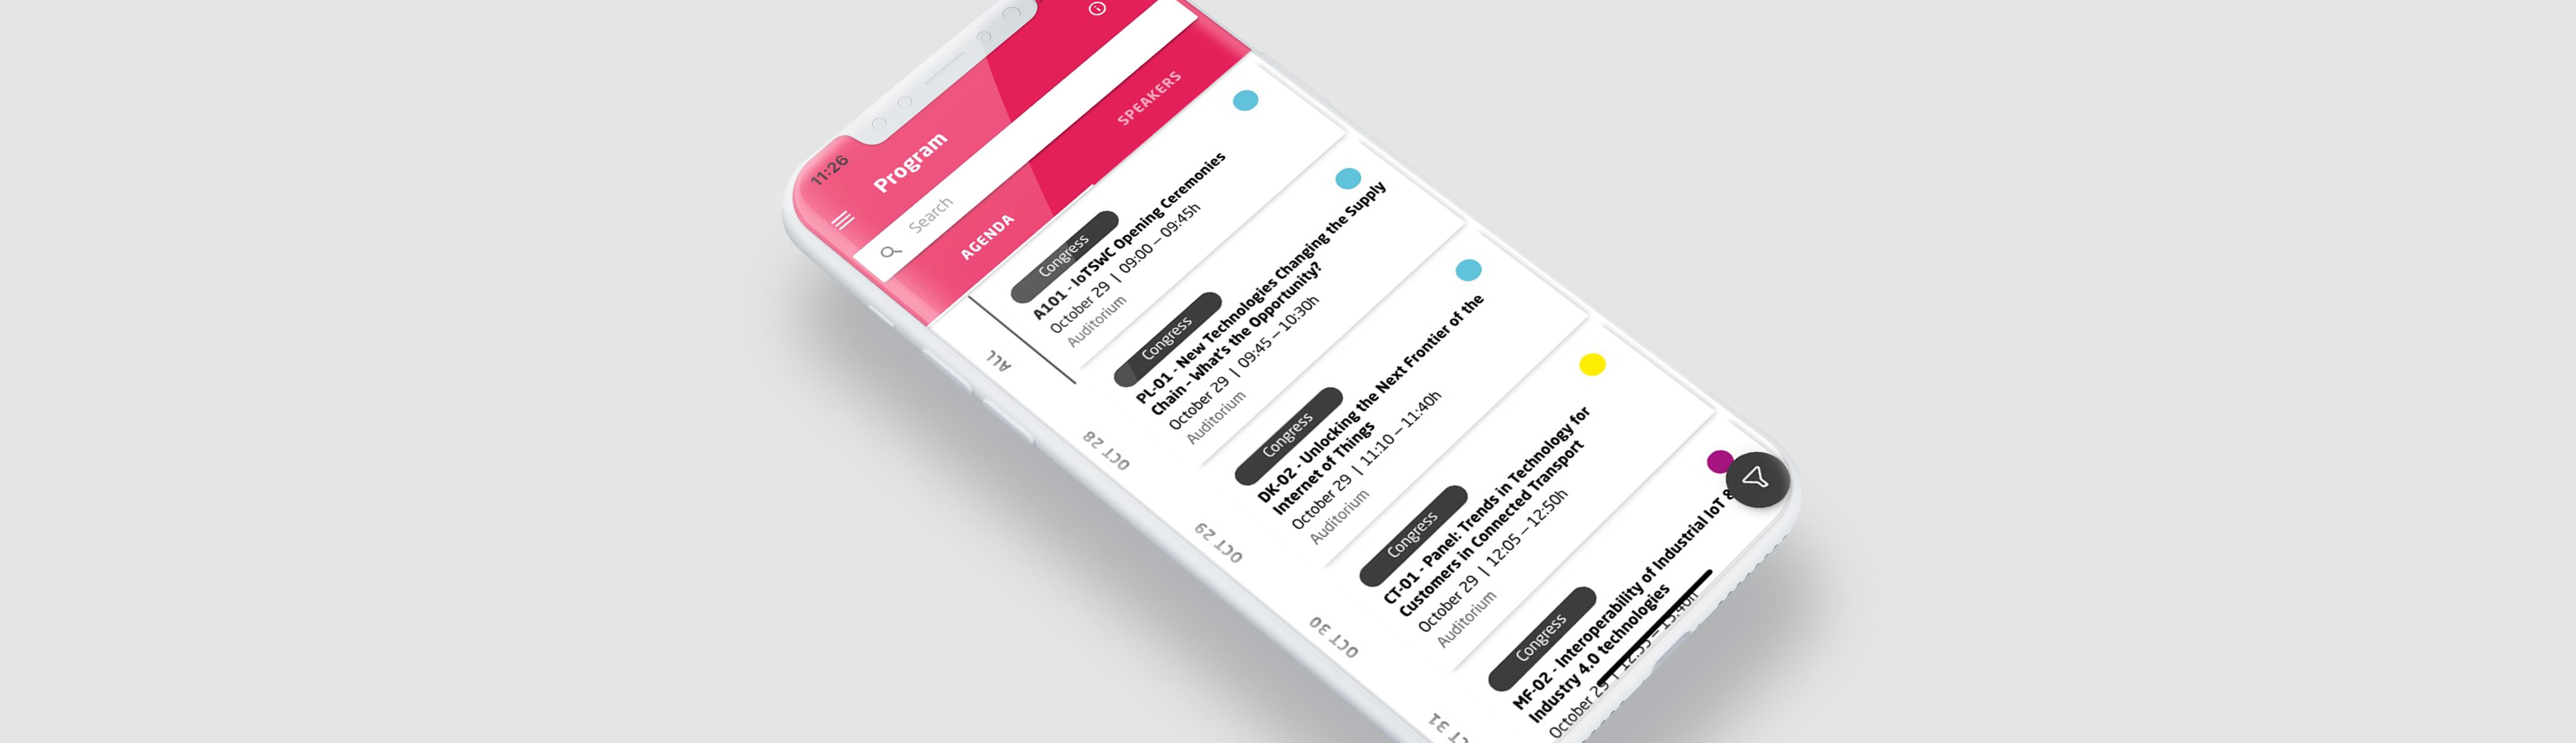 IOT_app_03a